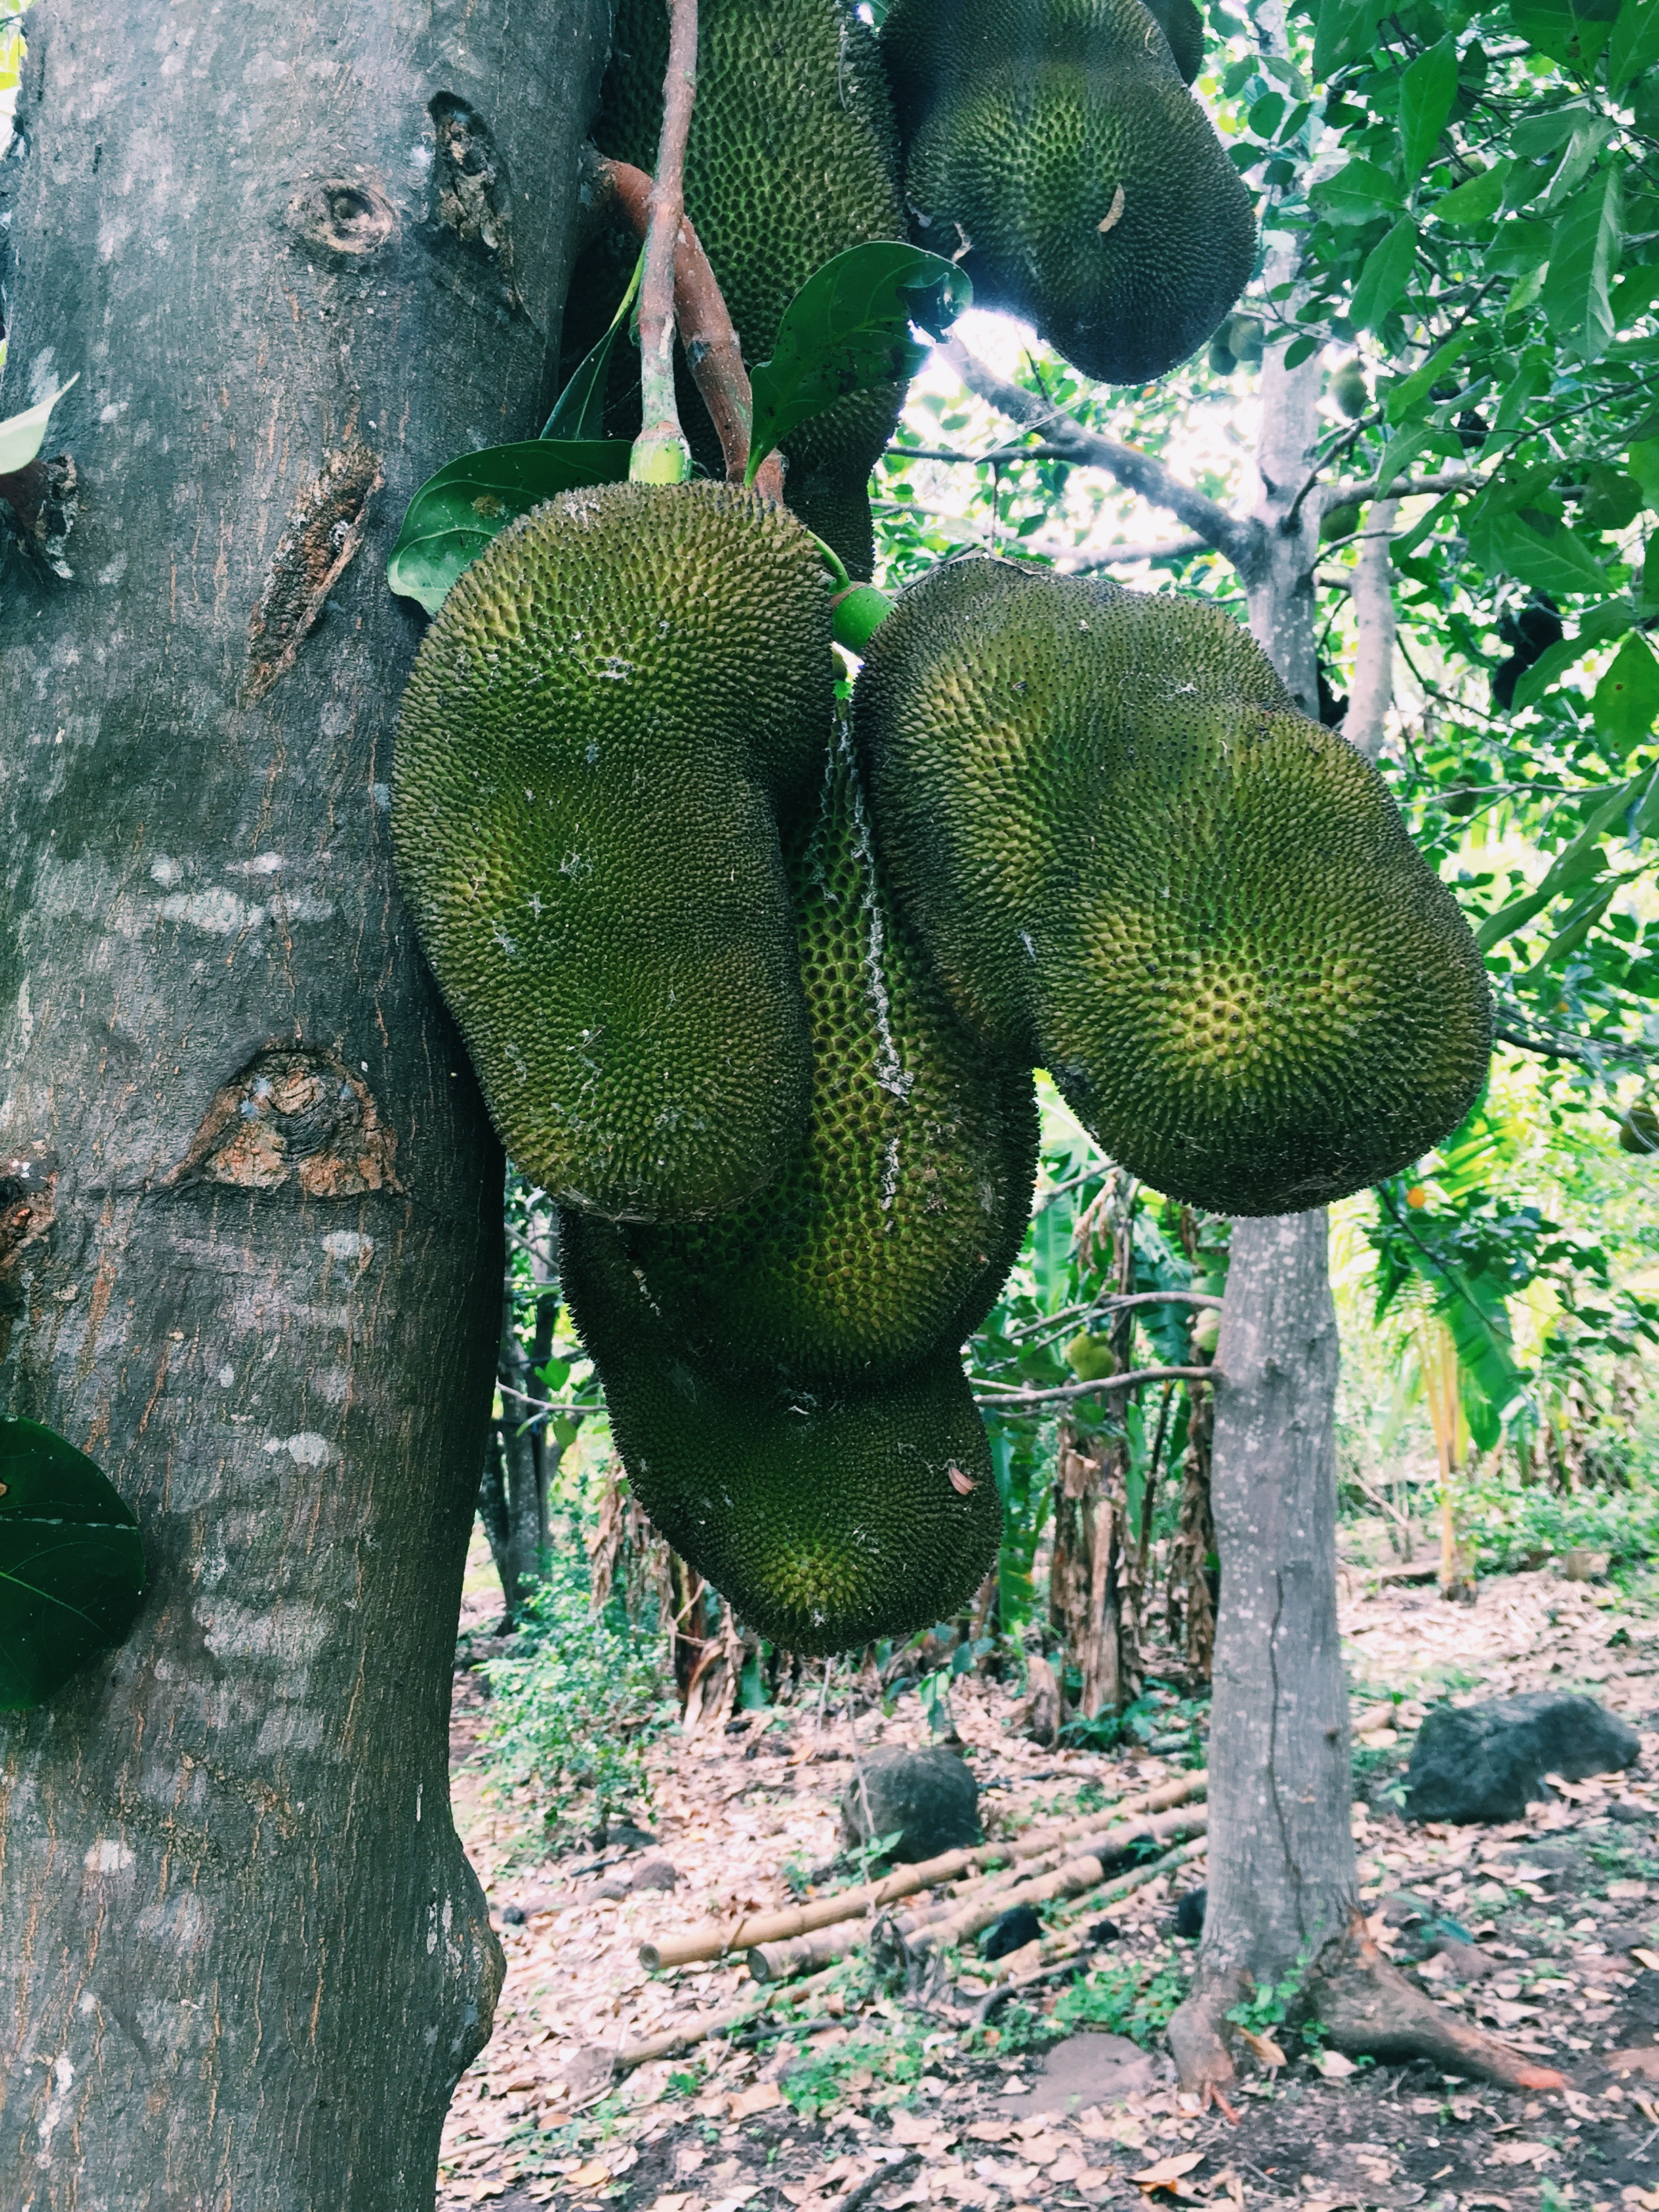 Jackfruit forest. AKA heaven!